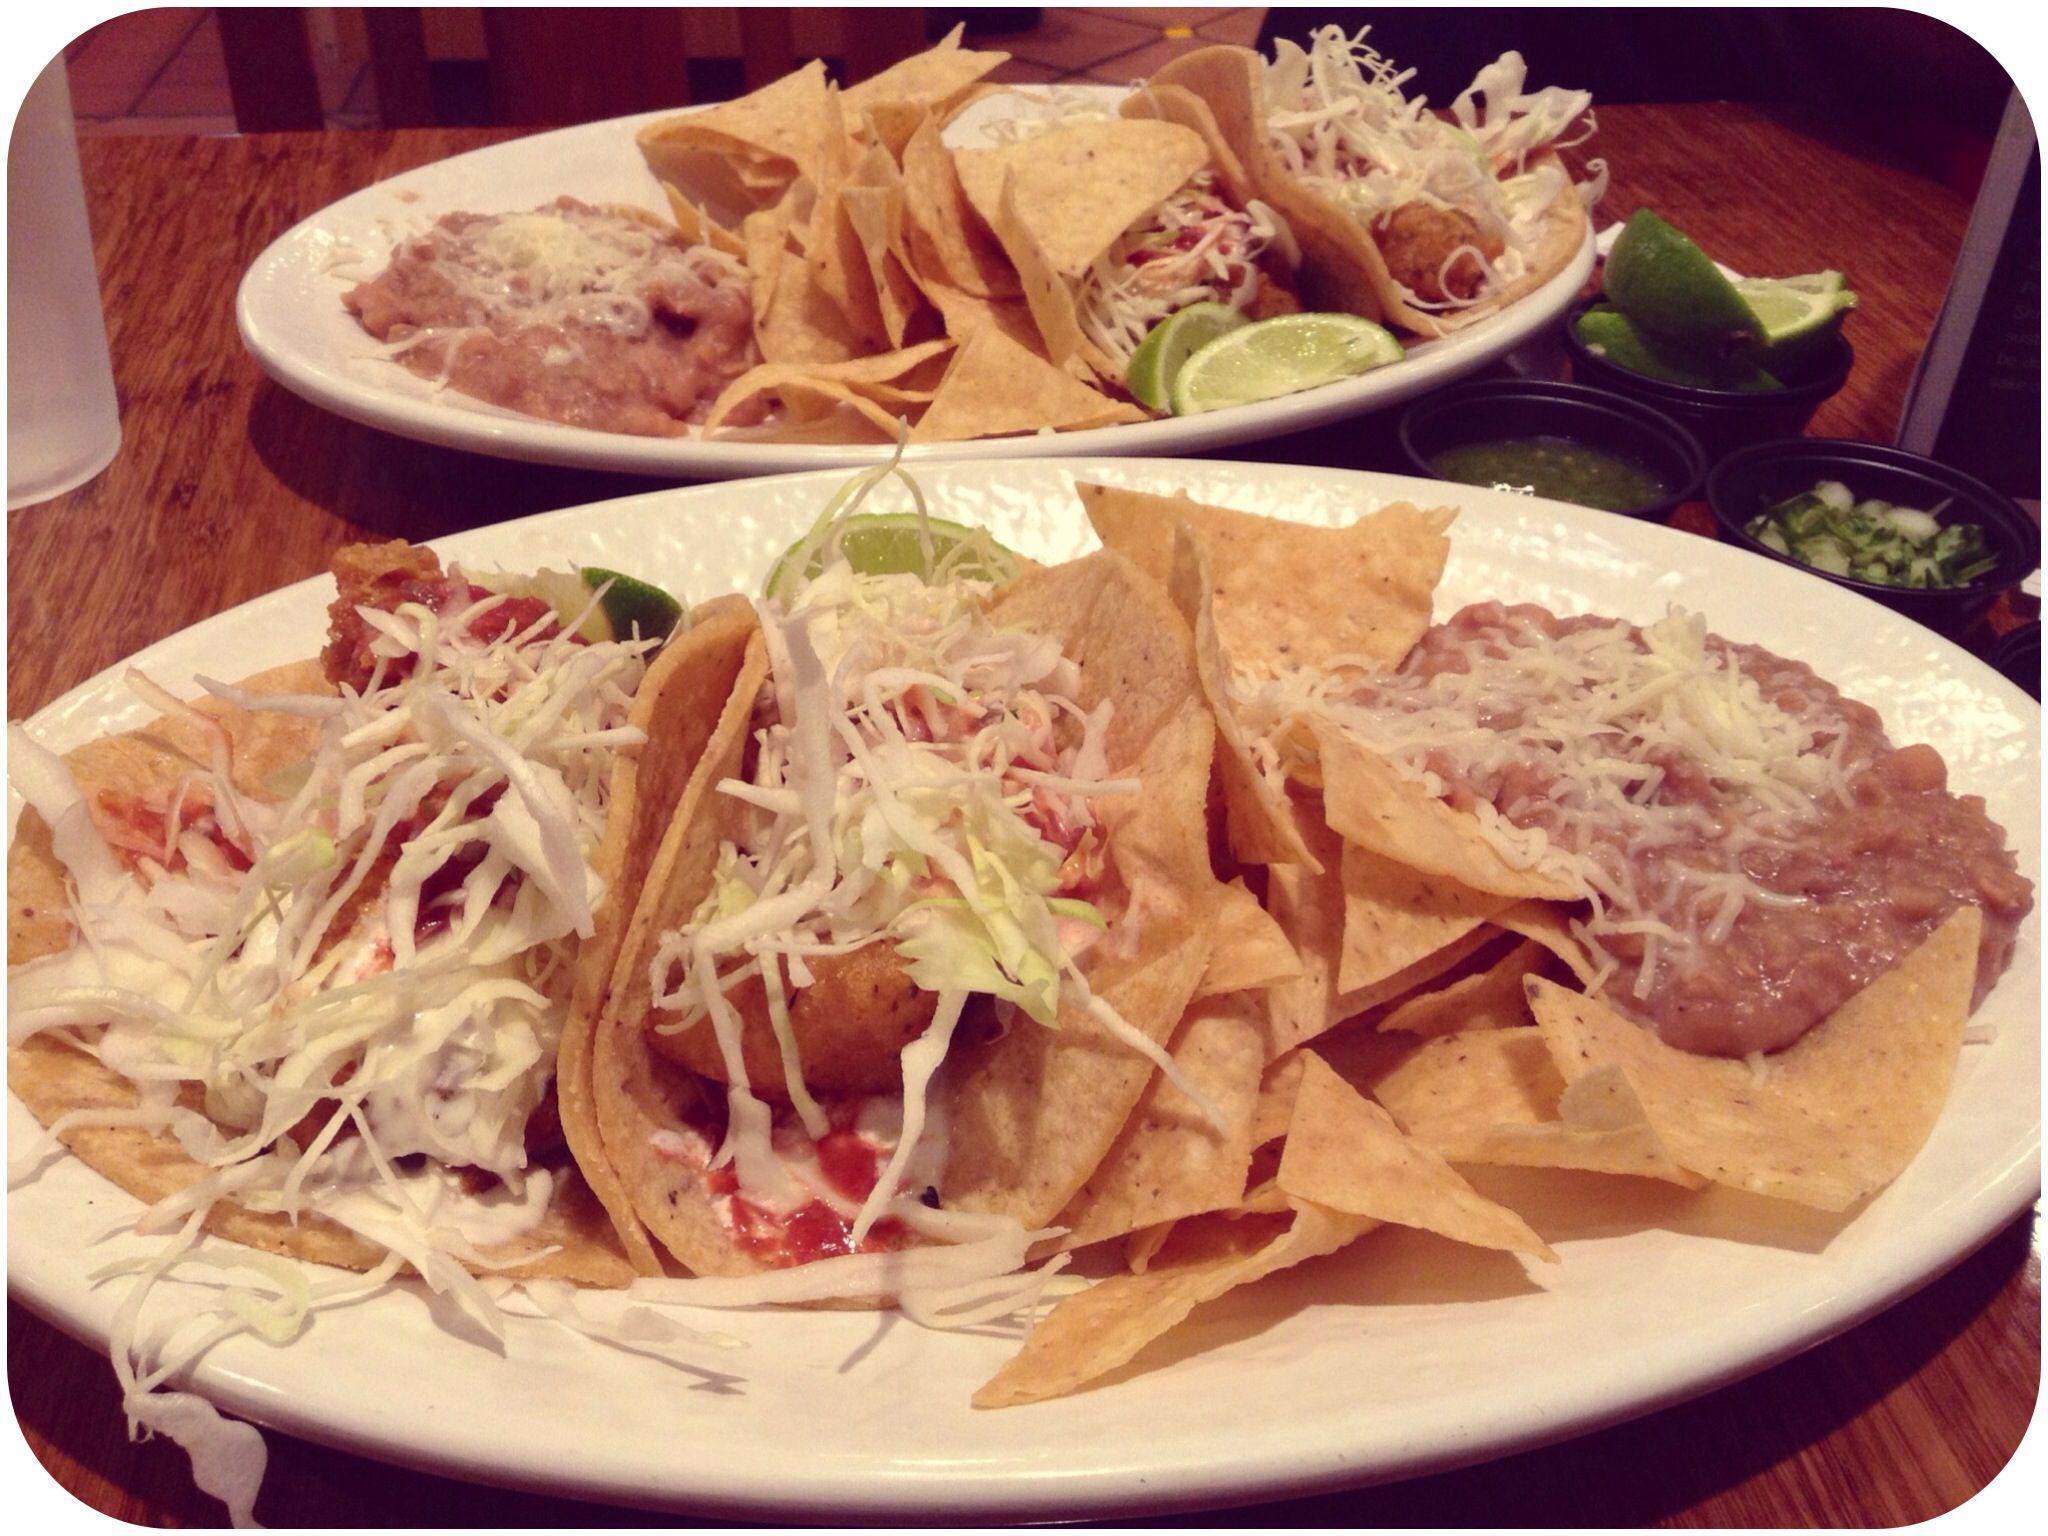 Fish taco plate | Nomz | Pinterest